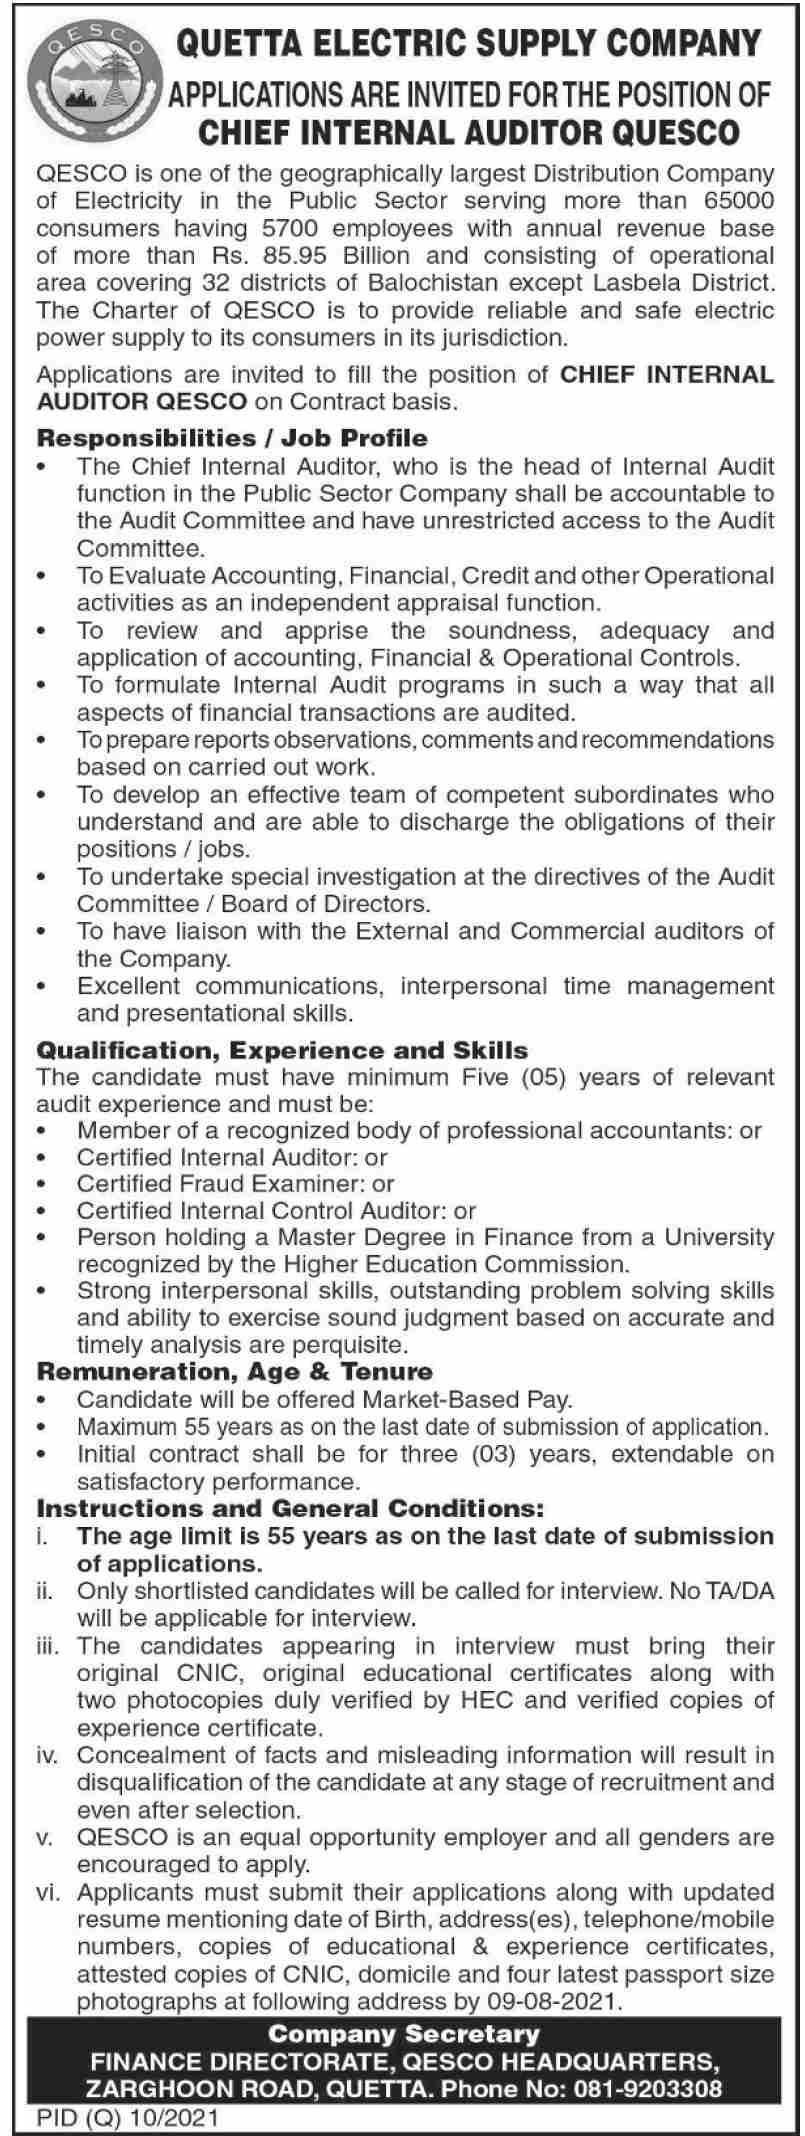 QESCO Chief Internal Auditor Jobs 2021